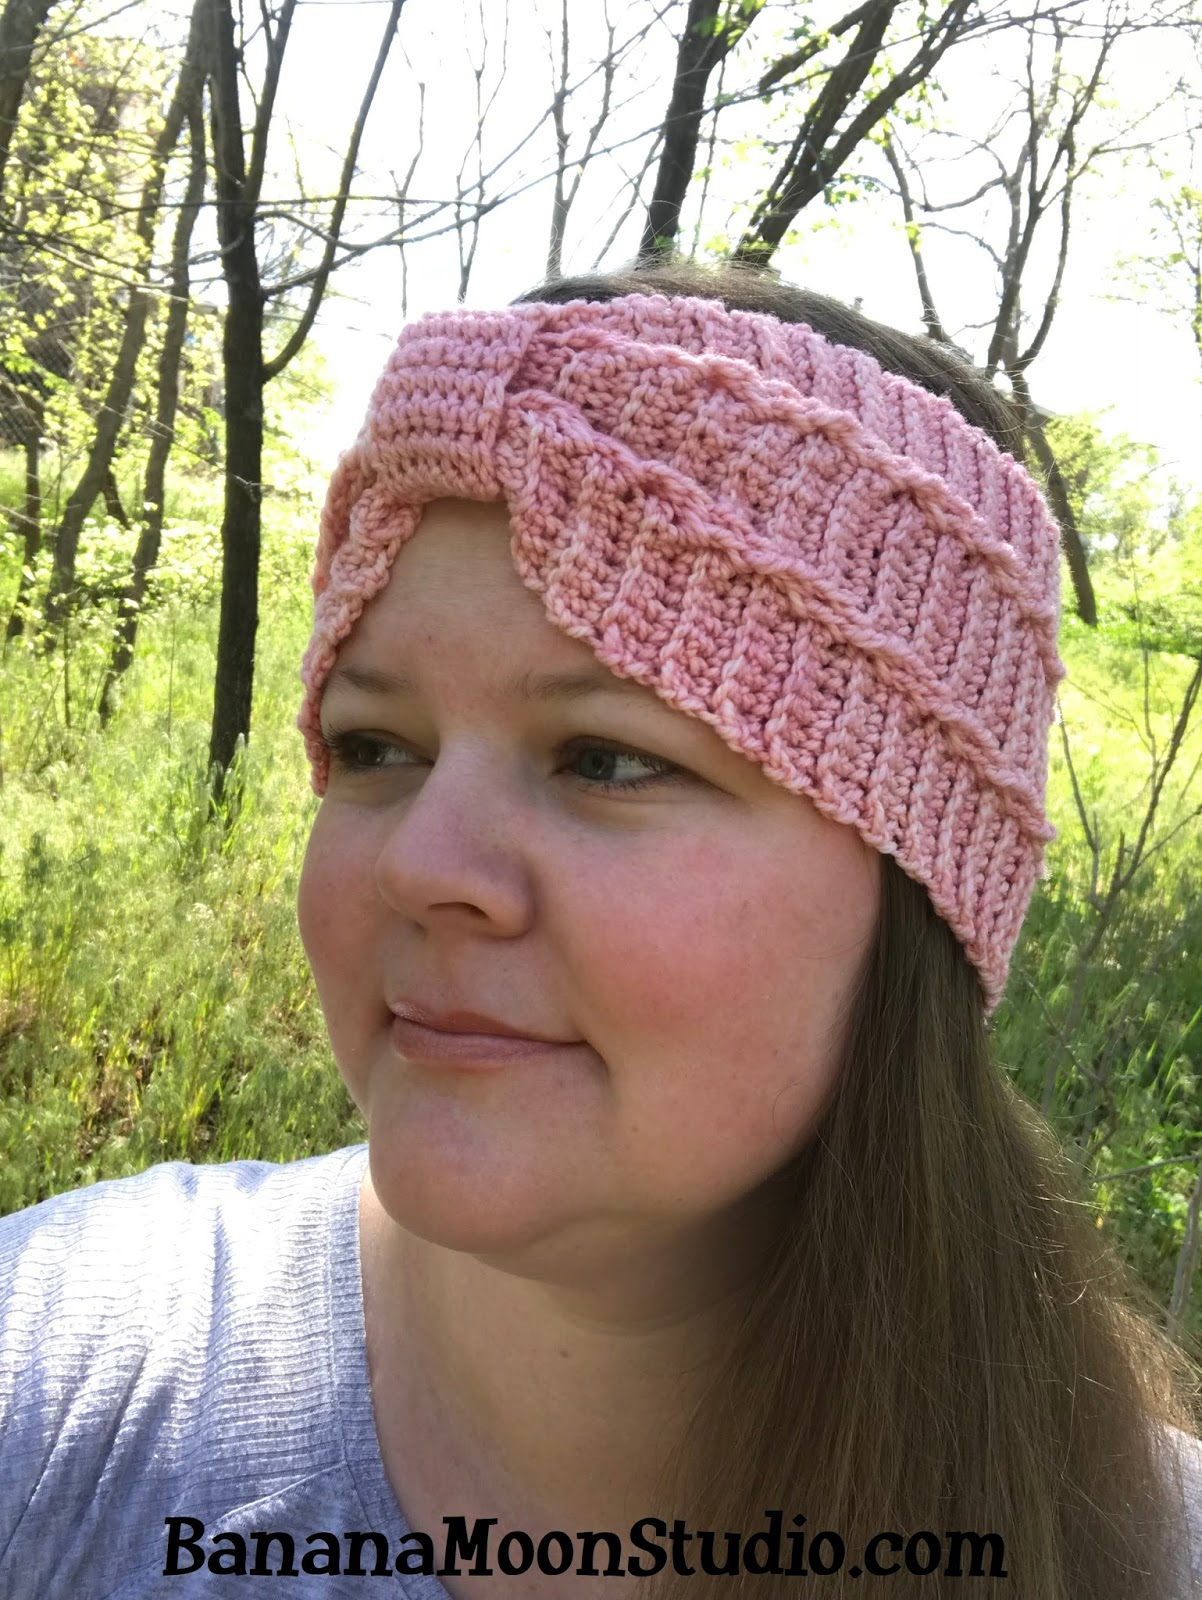 Crochet headband pattern by April Garwood of Banana Moon Studio